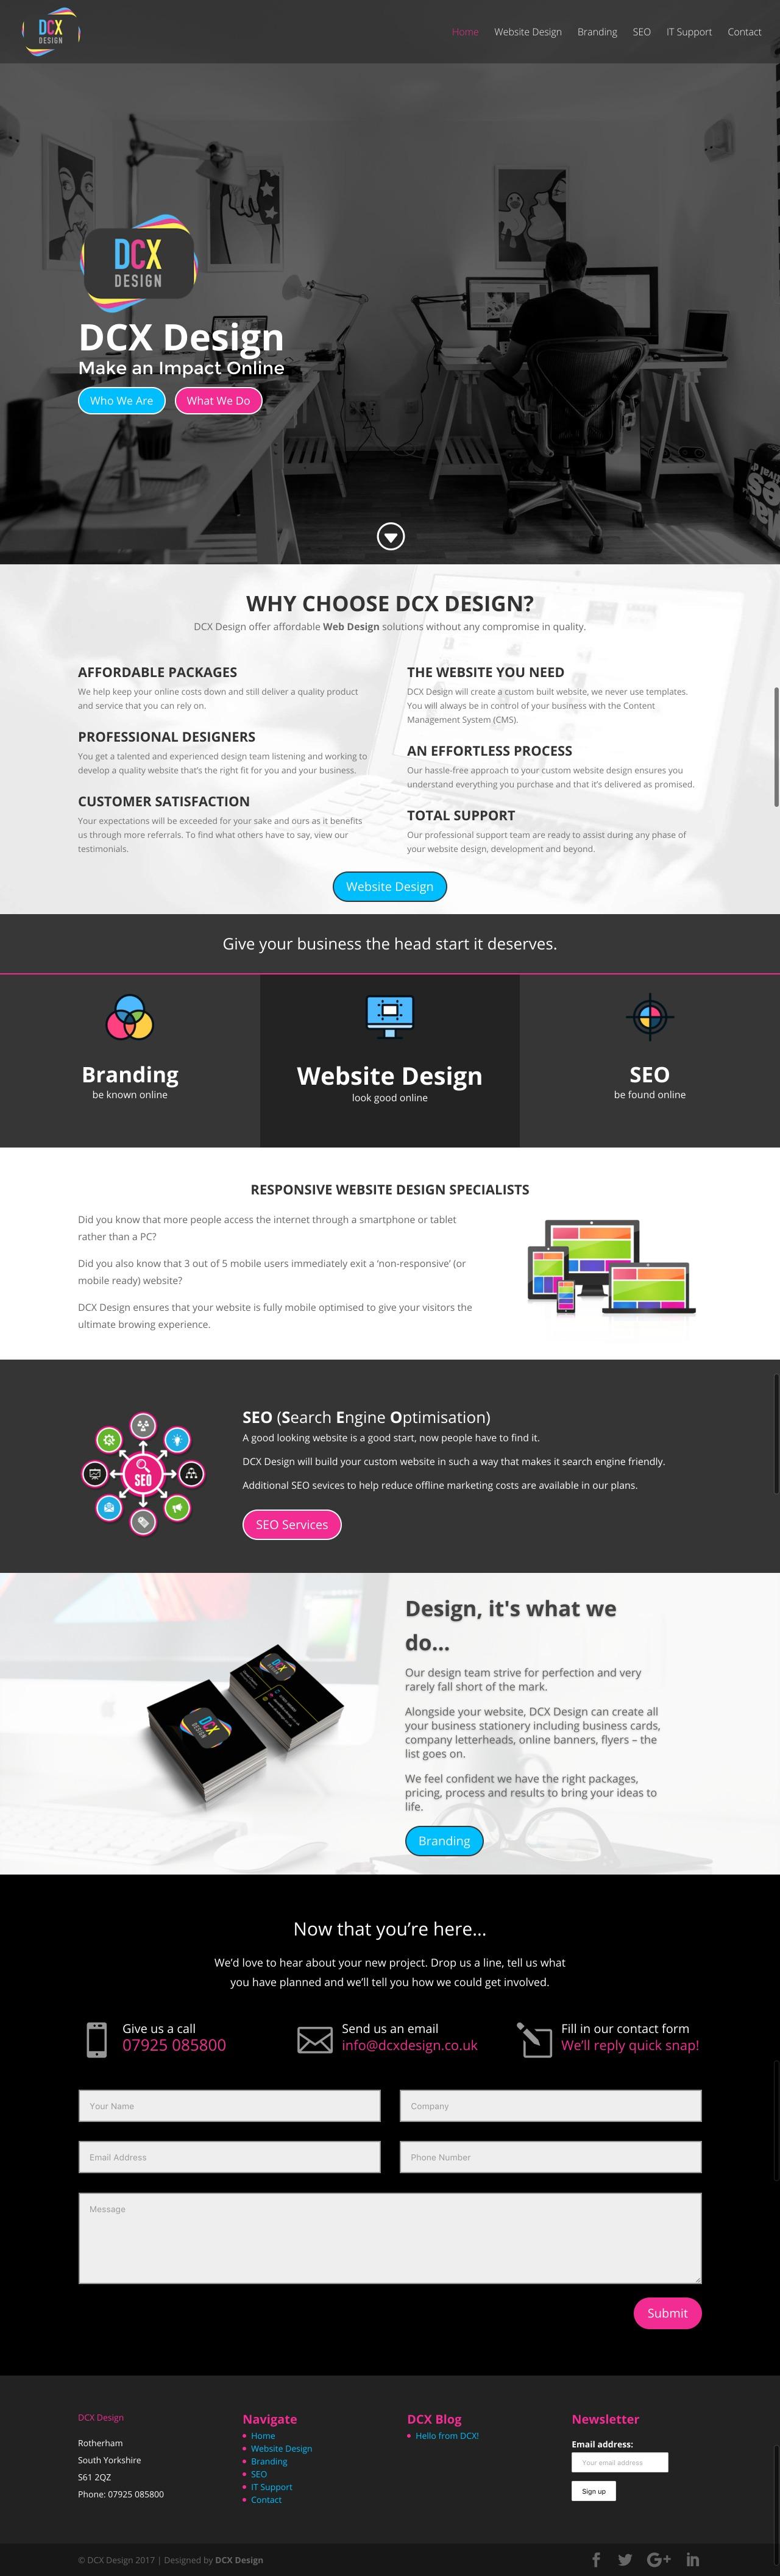 Dcx Design Web Design Branding Website Design Website Branding